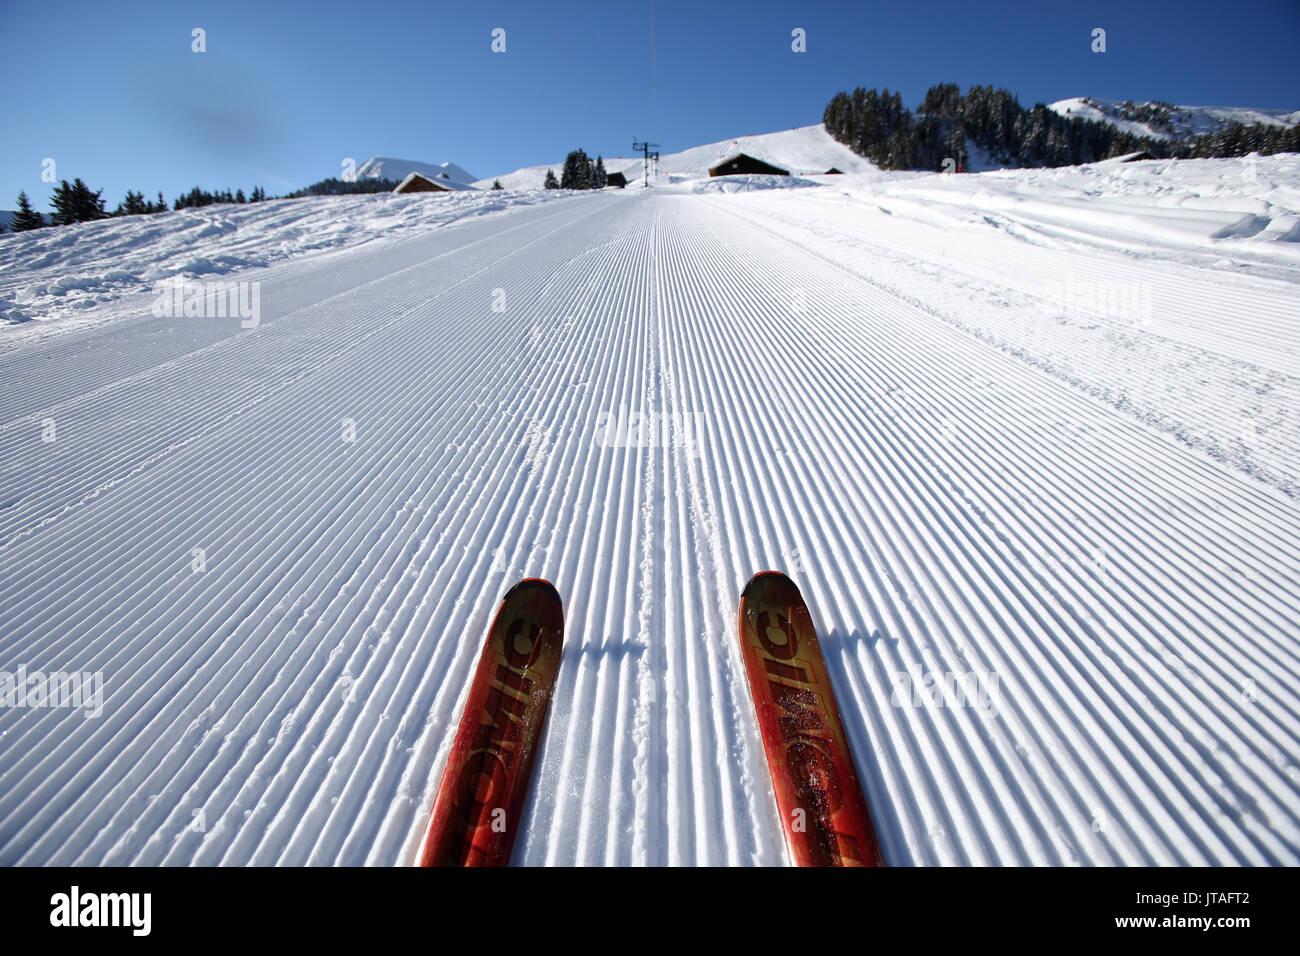 Red pair of ski in snow, groomed ski piste in the French Alps, Haute-Savoie, France, Europe - Stock Image